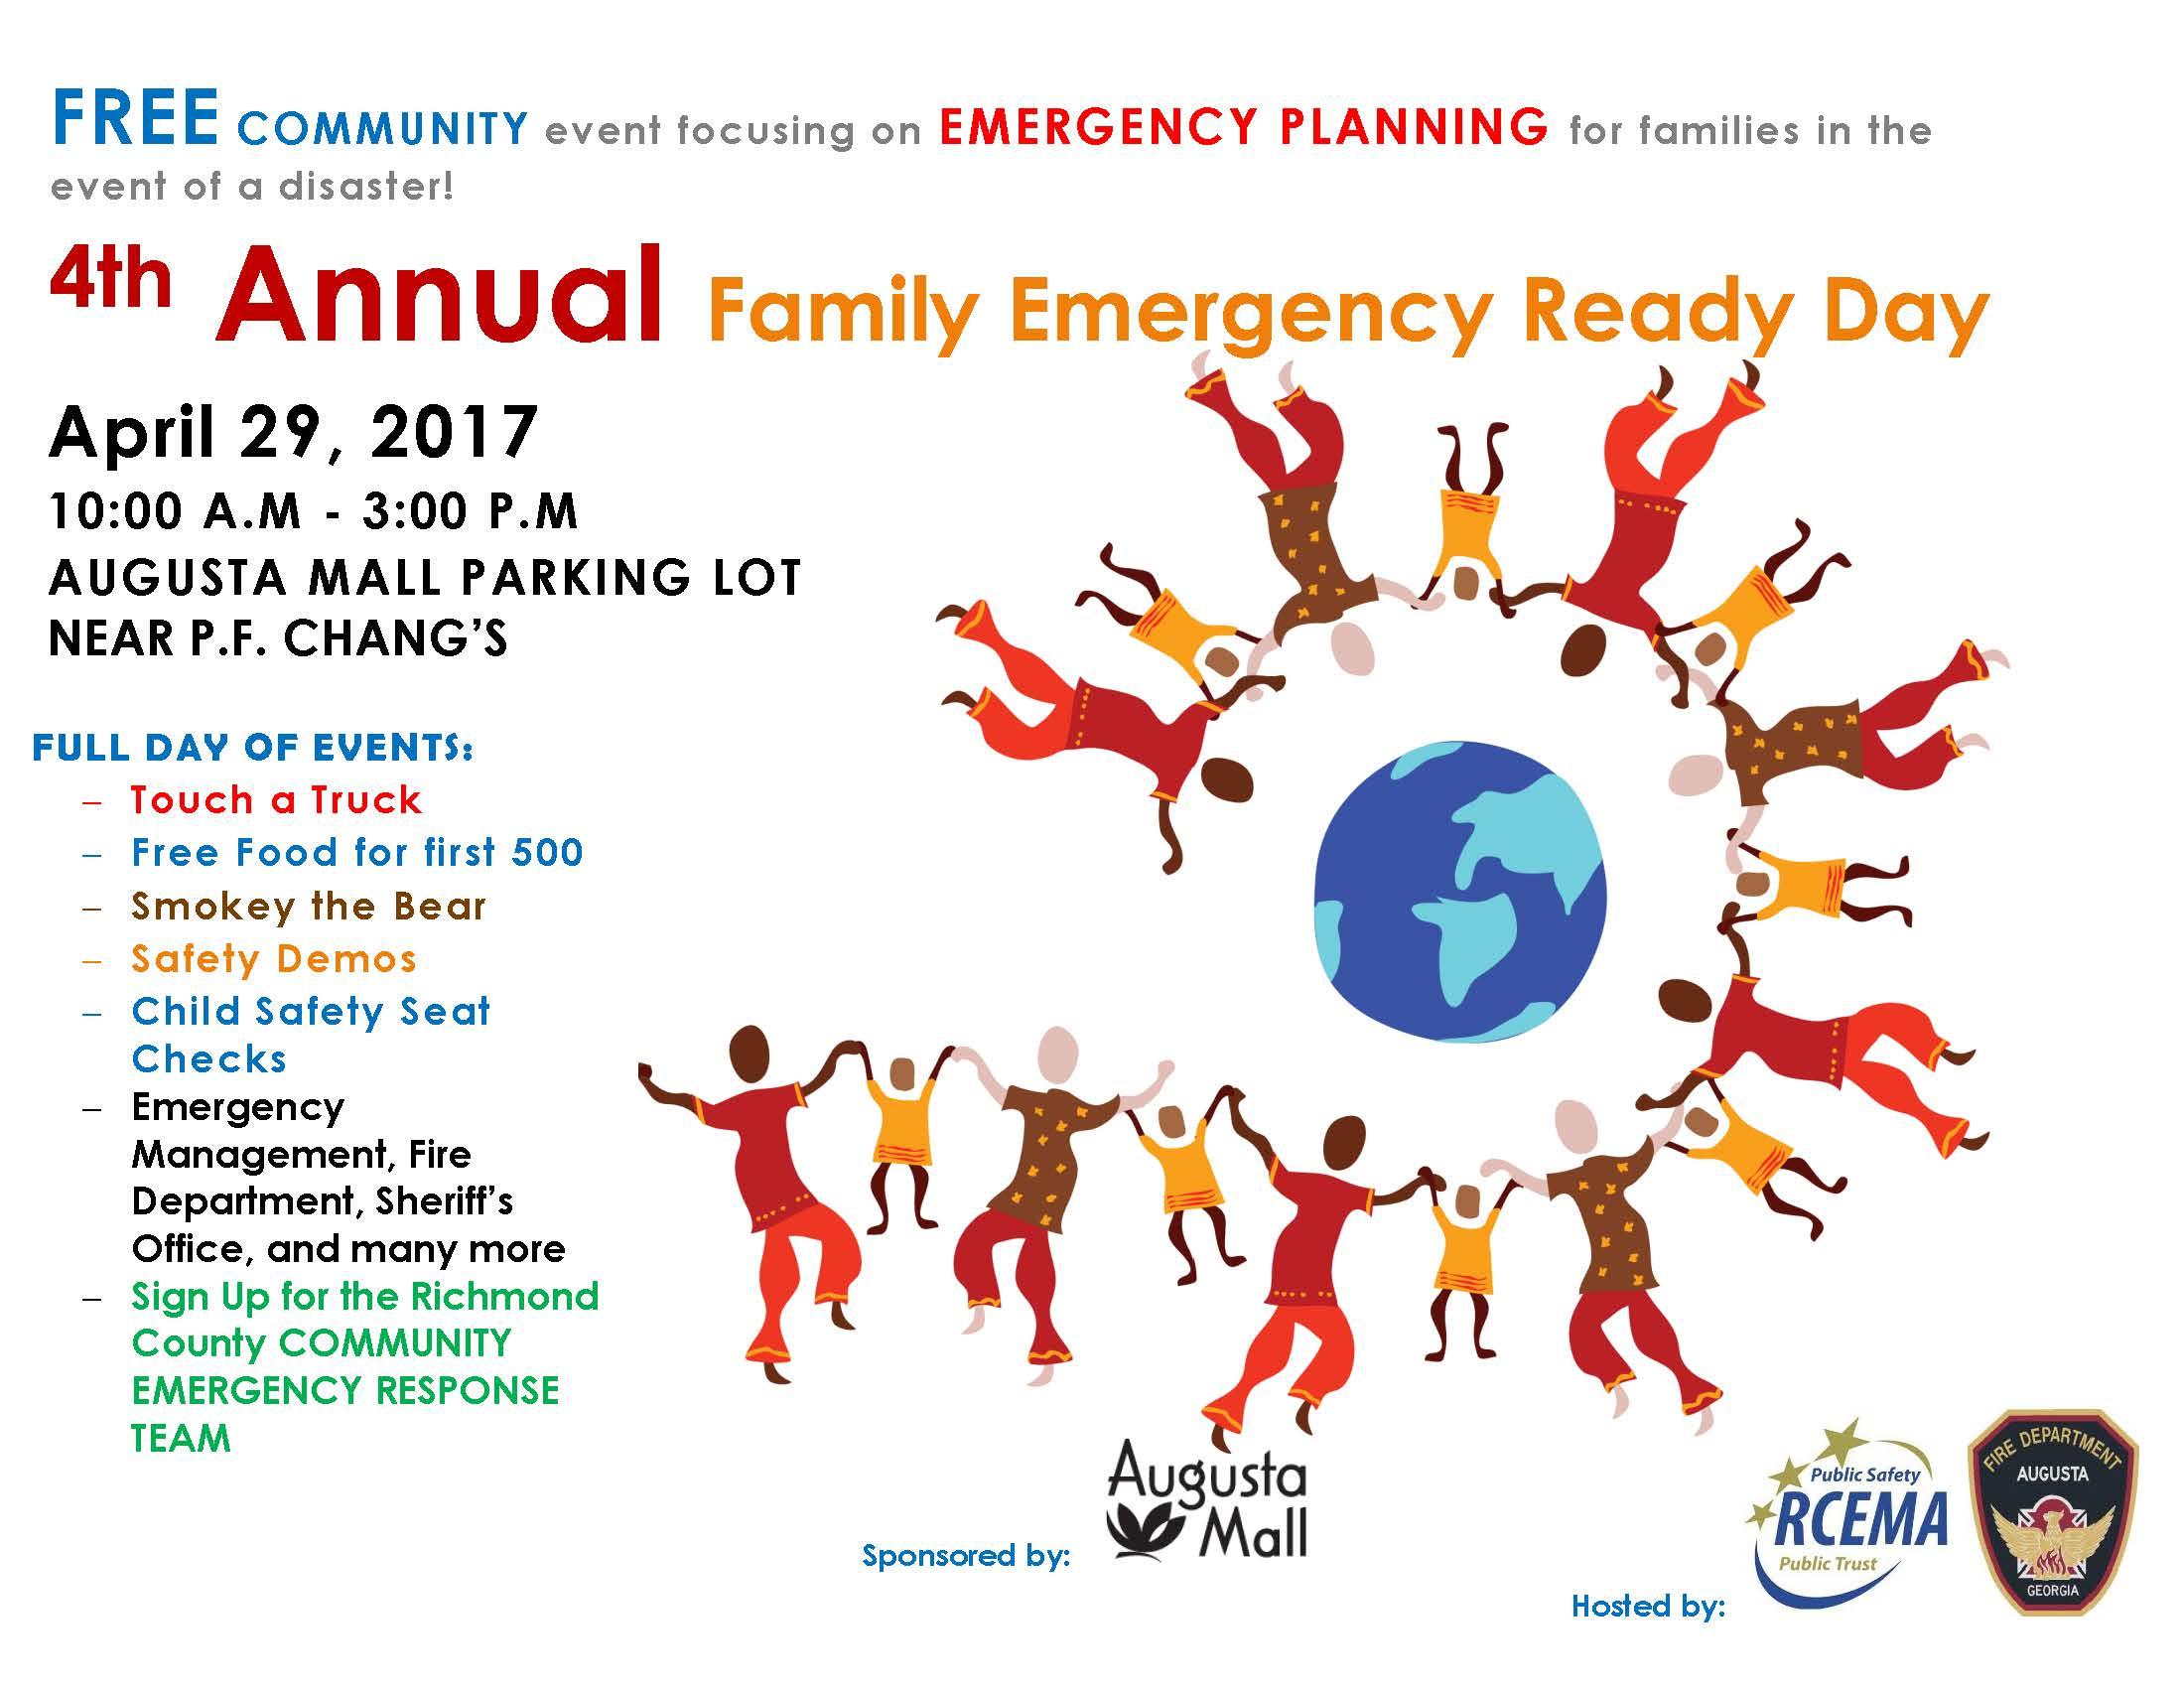 Family Emergency Ready Day